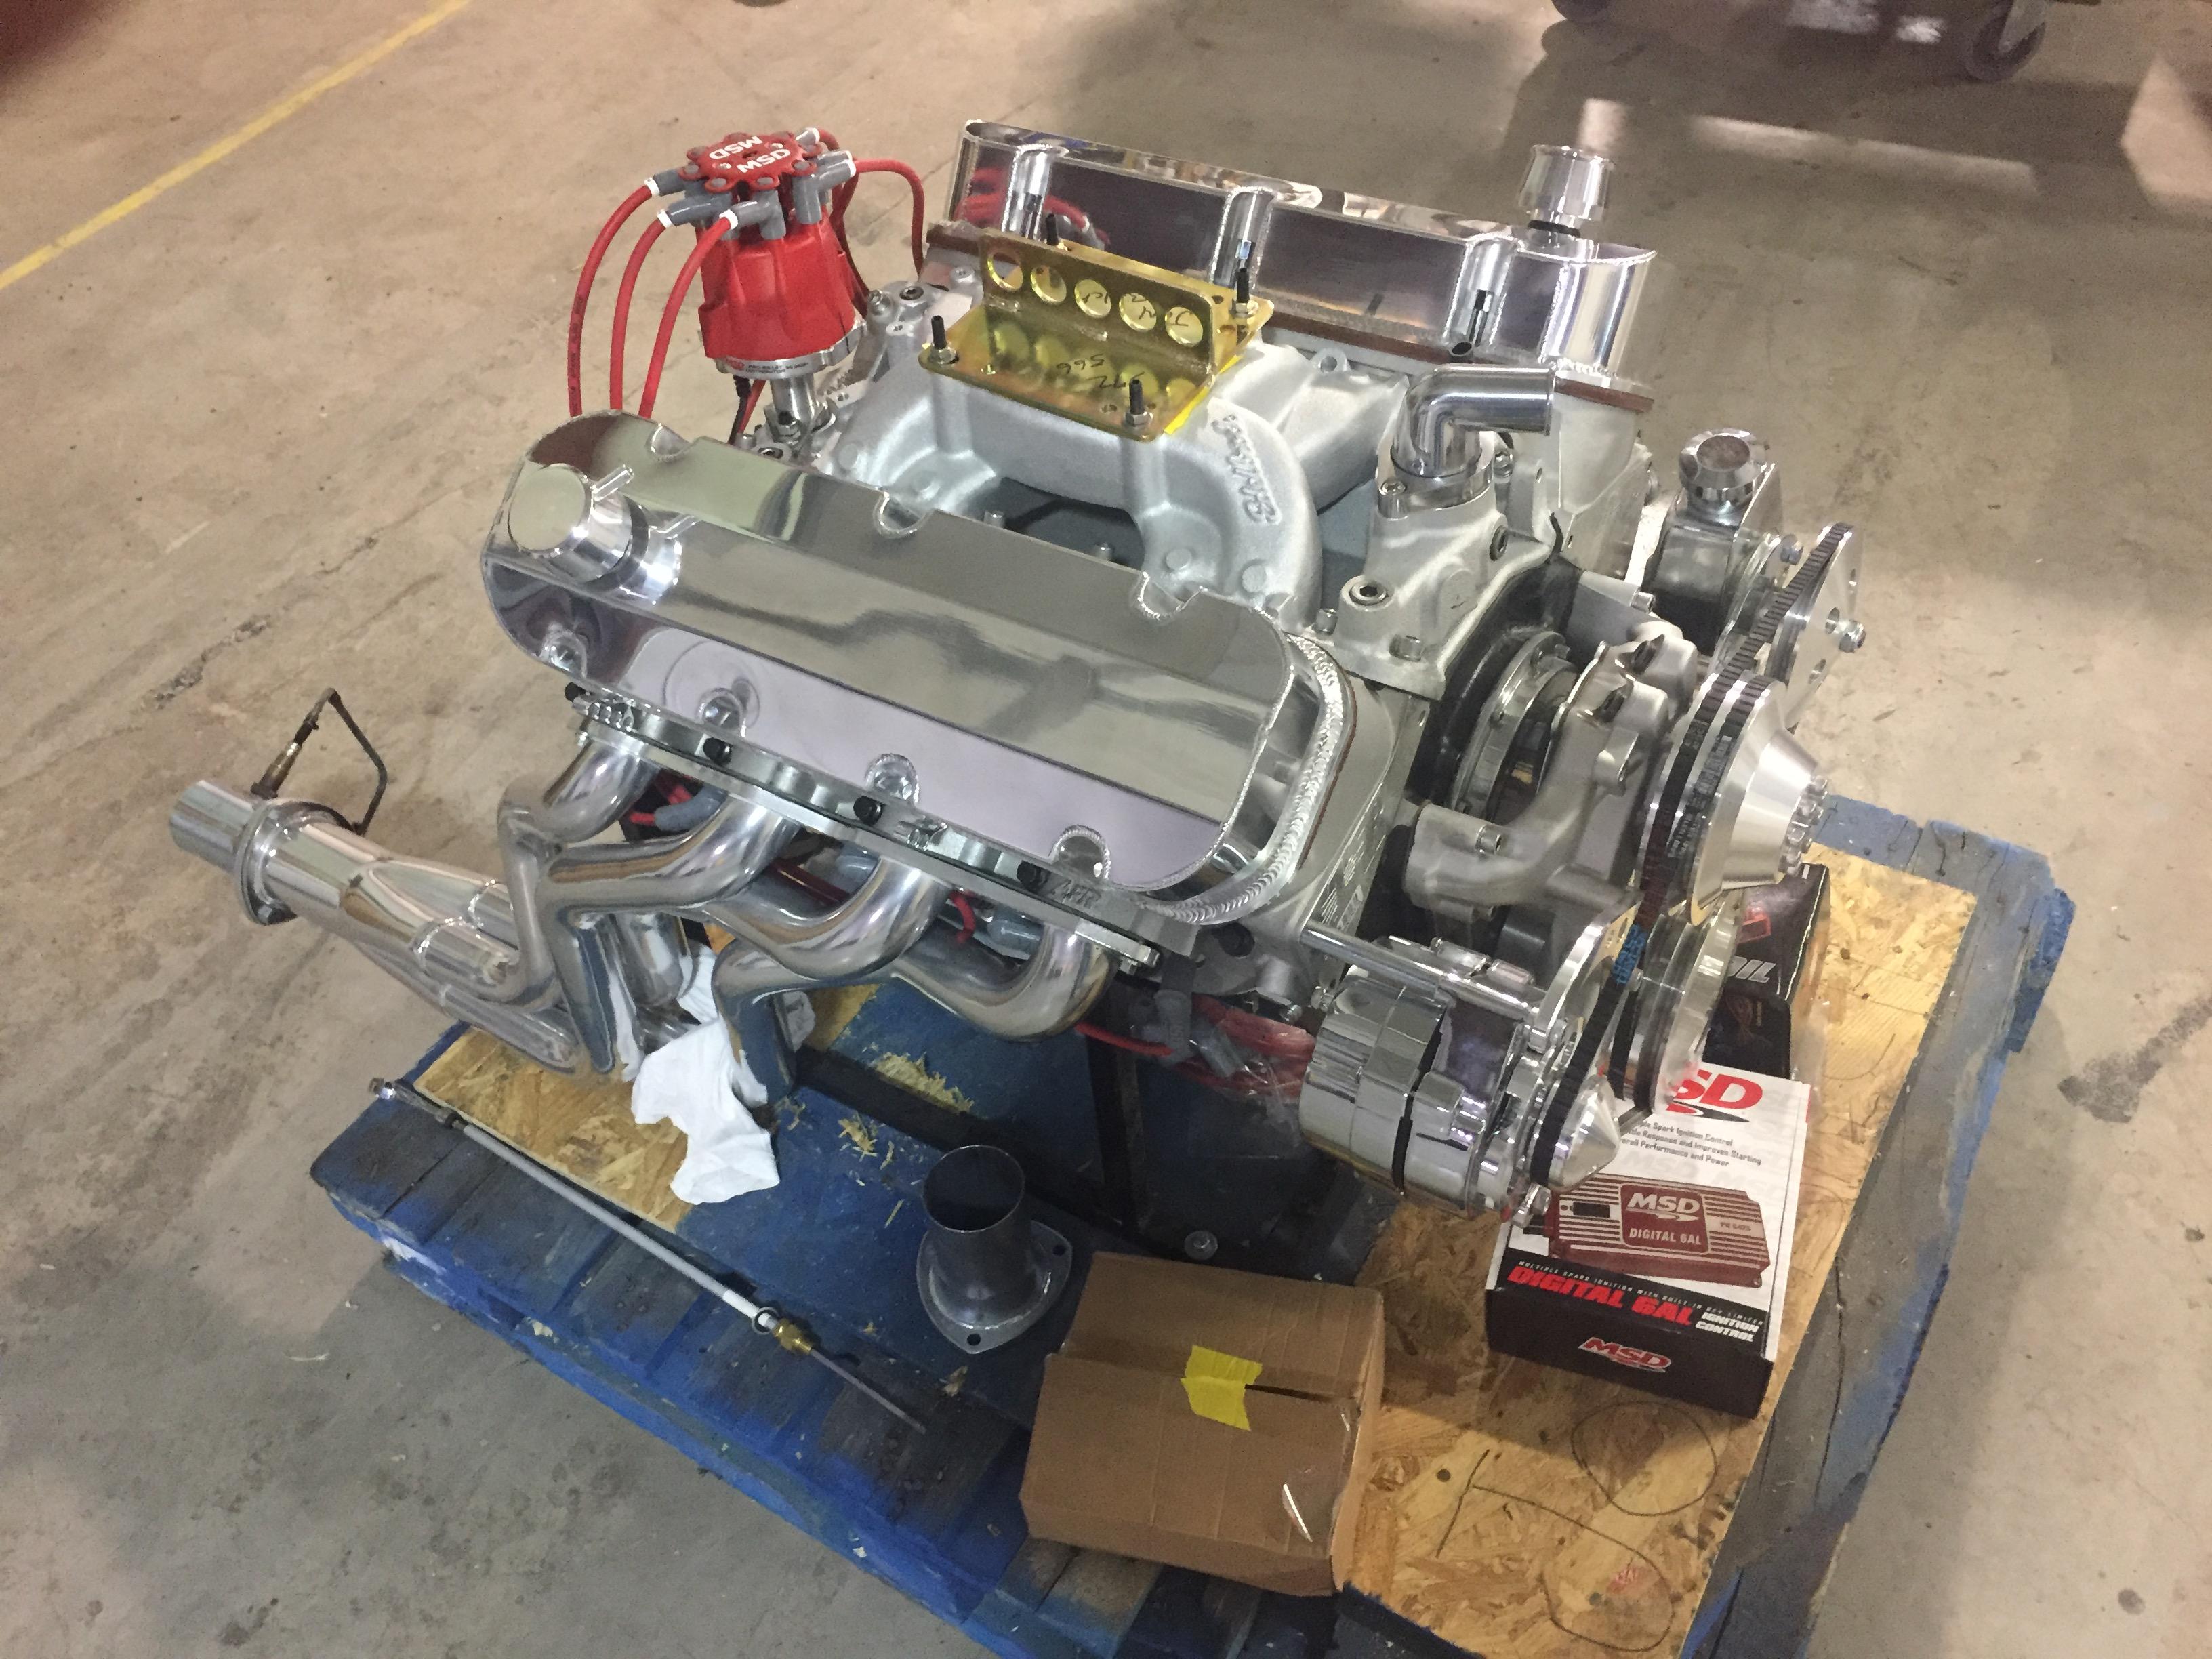 527 Cubic Inch Big Block Crate Motor